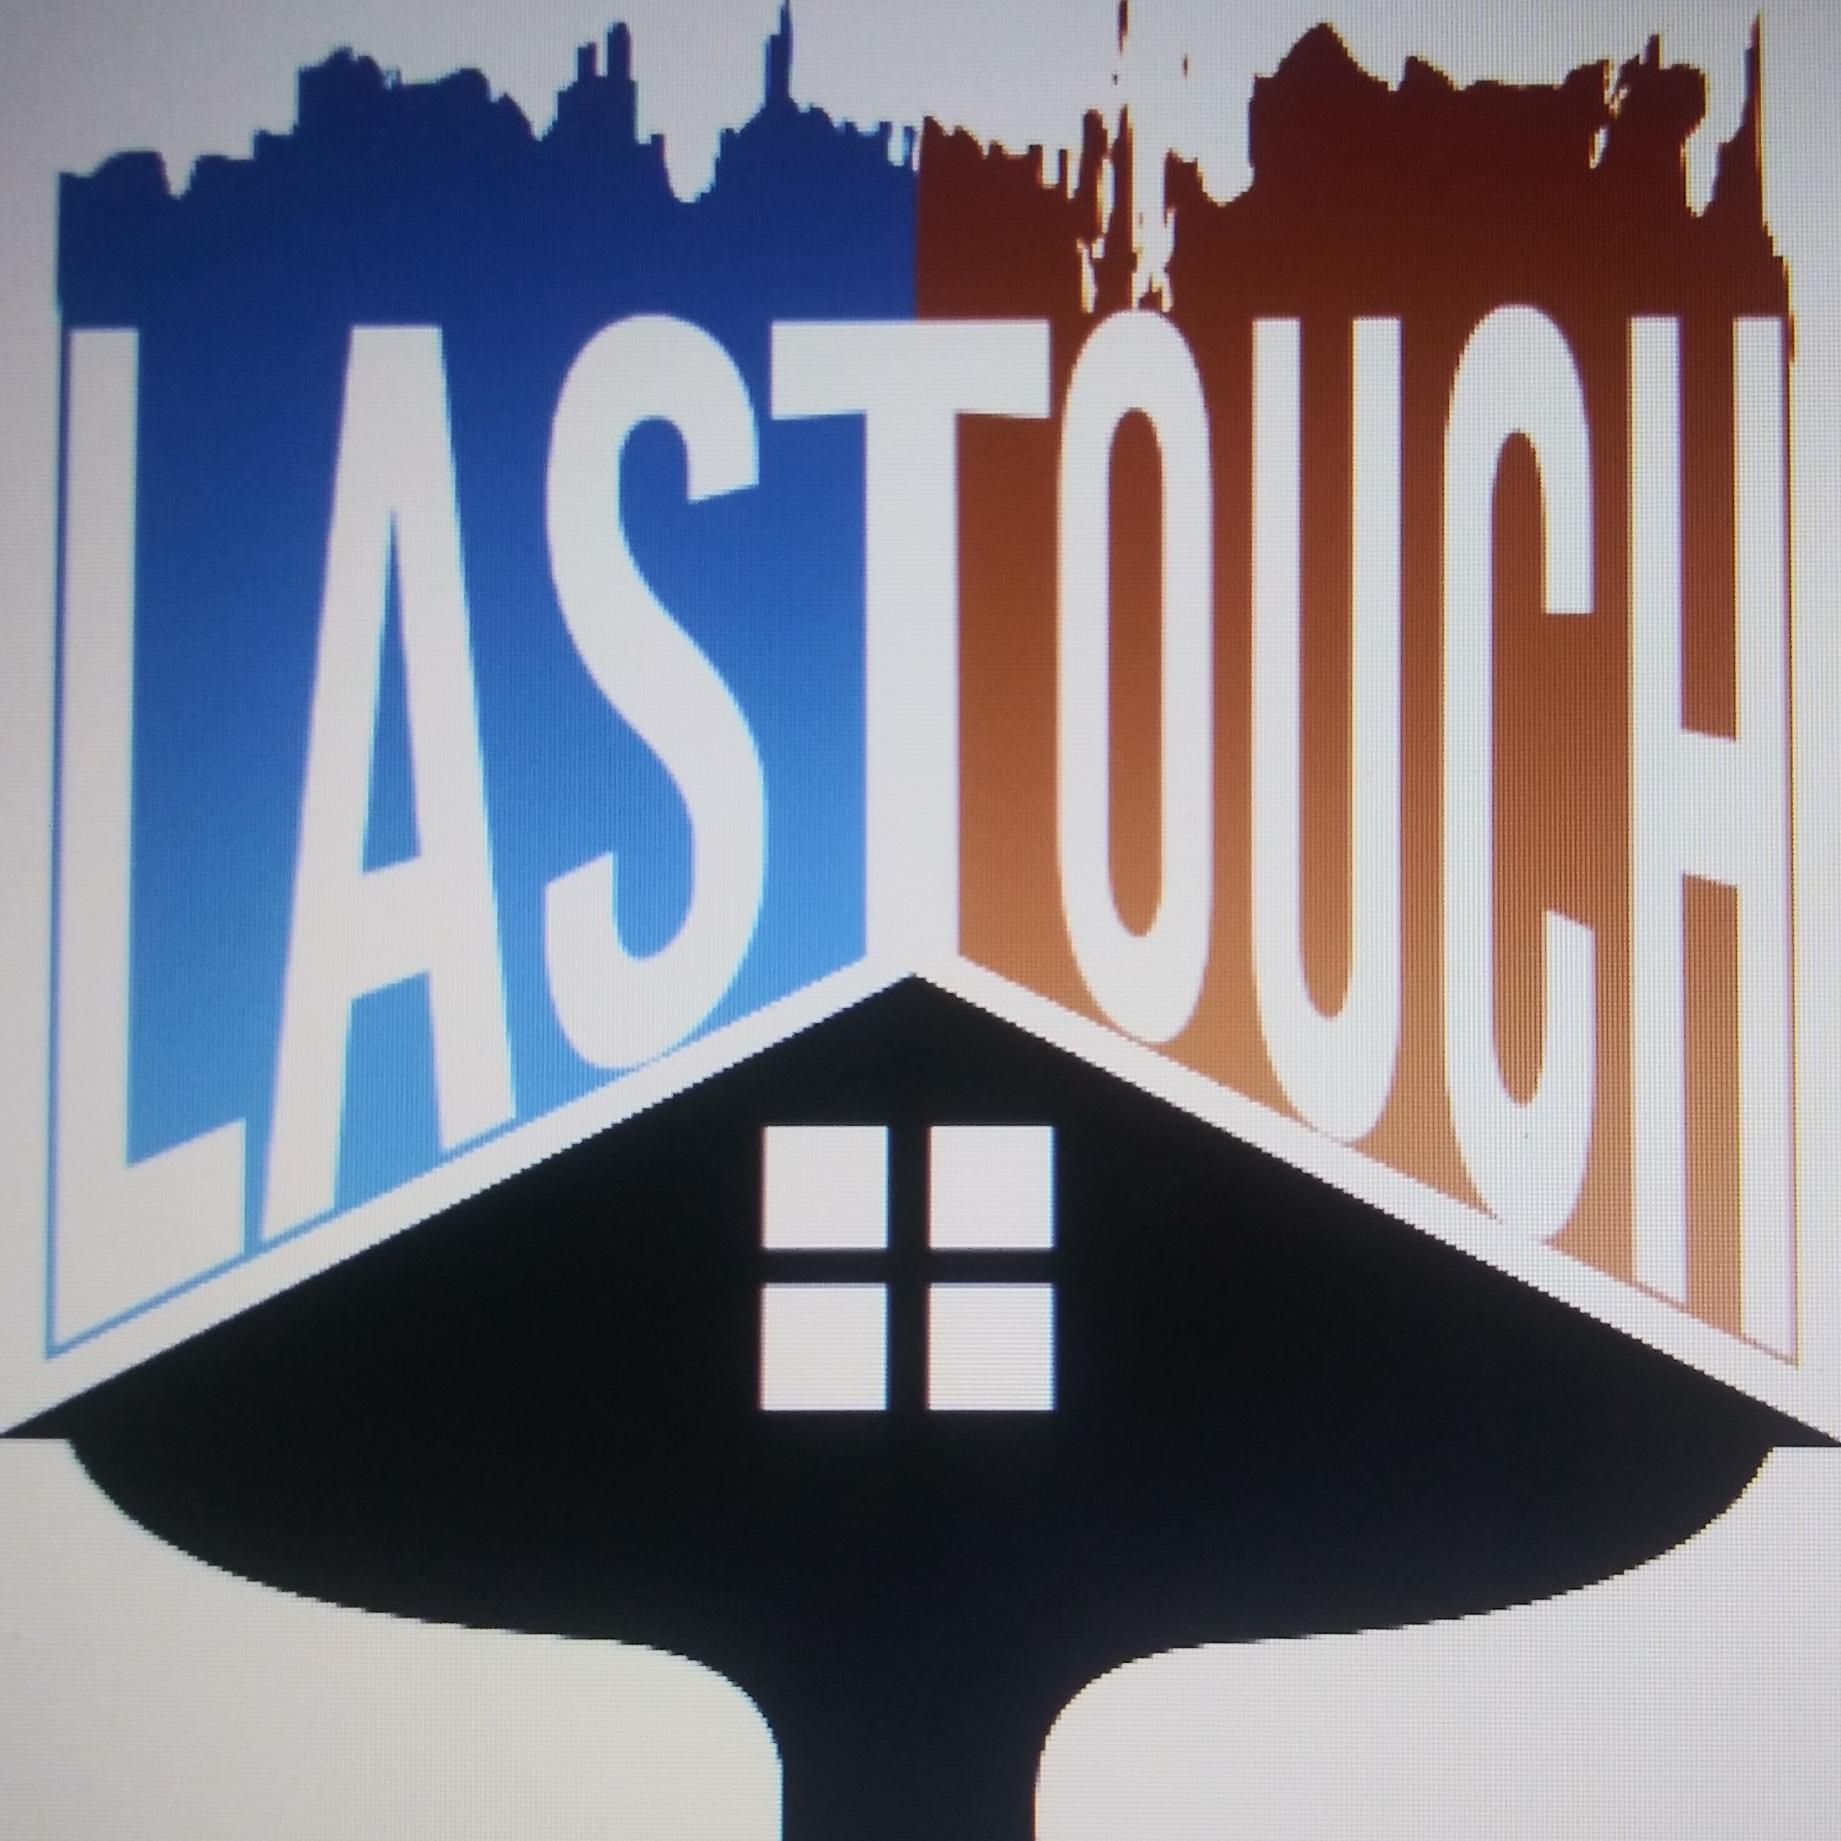 Last Touch MIA. Corp